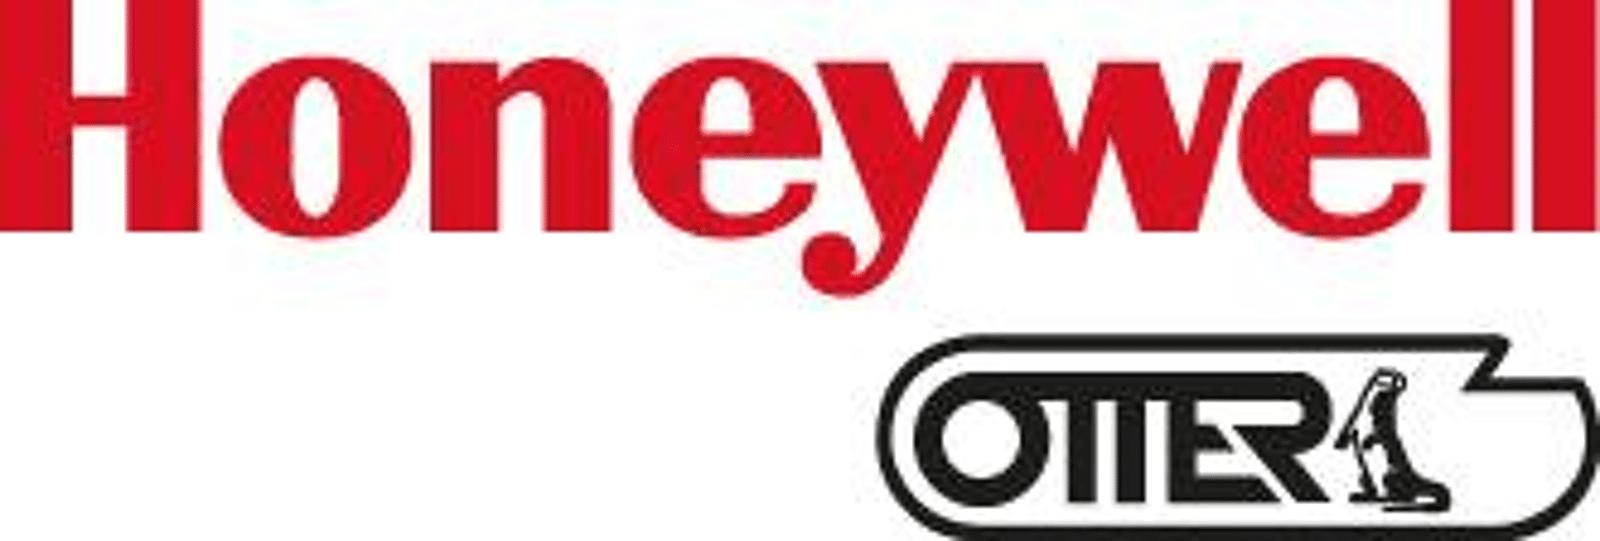 Honeywell Otter